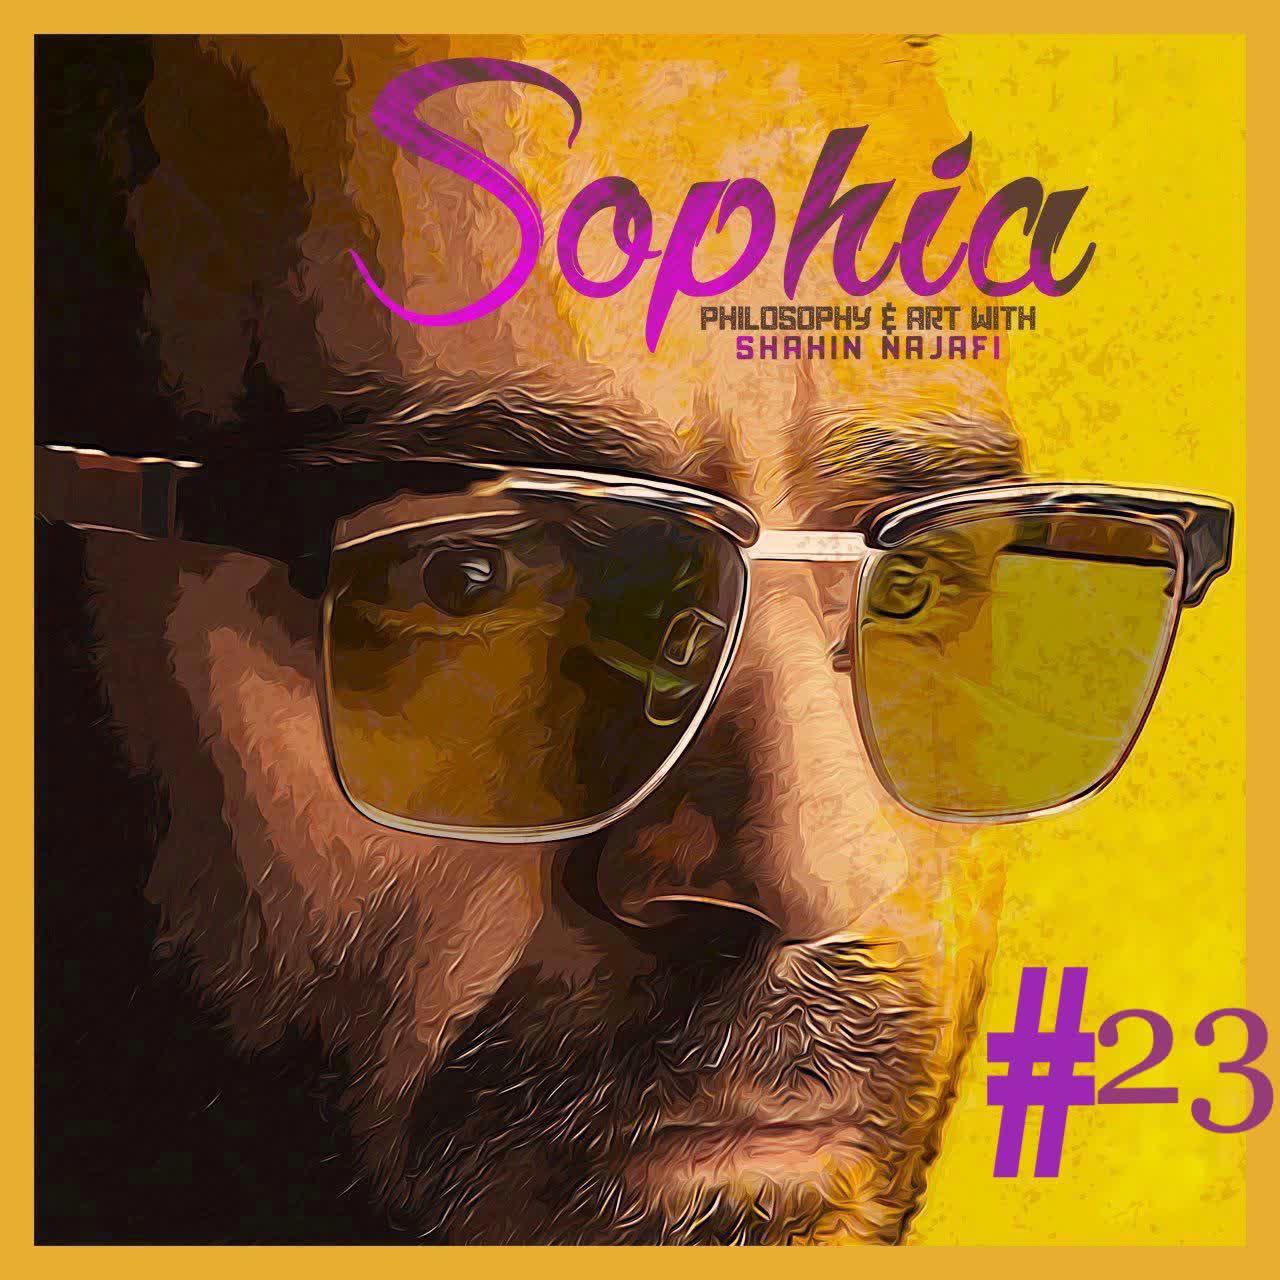 Sophia #23 Aristotle 2- Shahin Najafi & Veria Amiri سوفیا ۲۳ - ارسطو ۲ - شاهین نجفی و وریا امیری